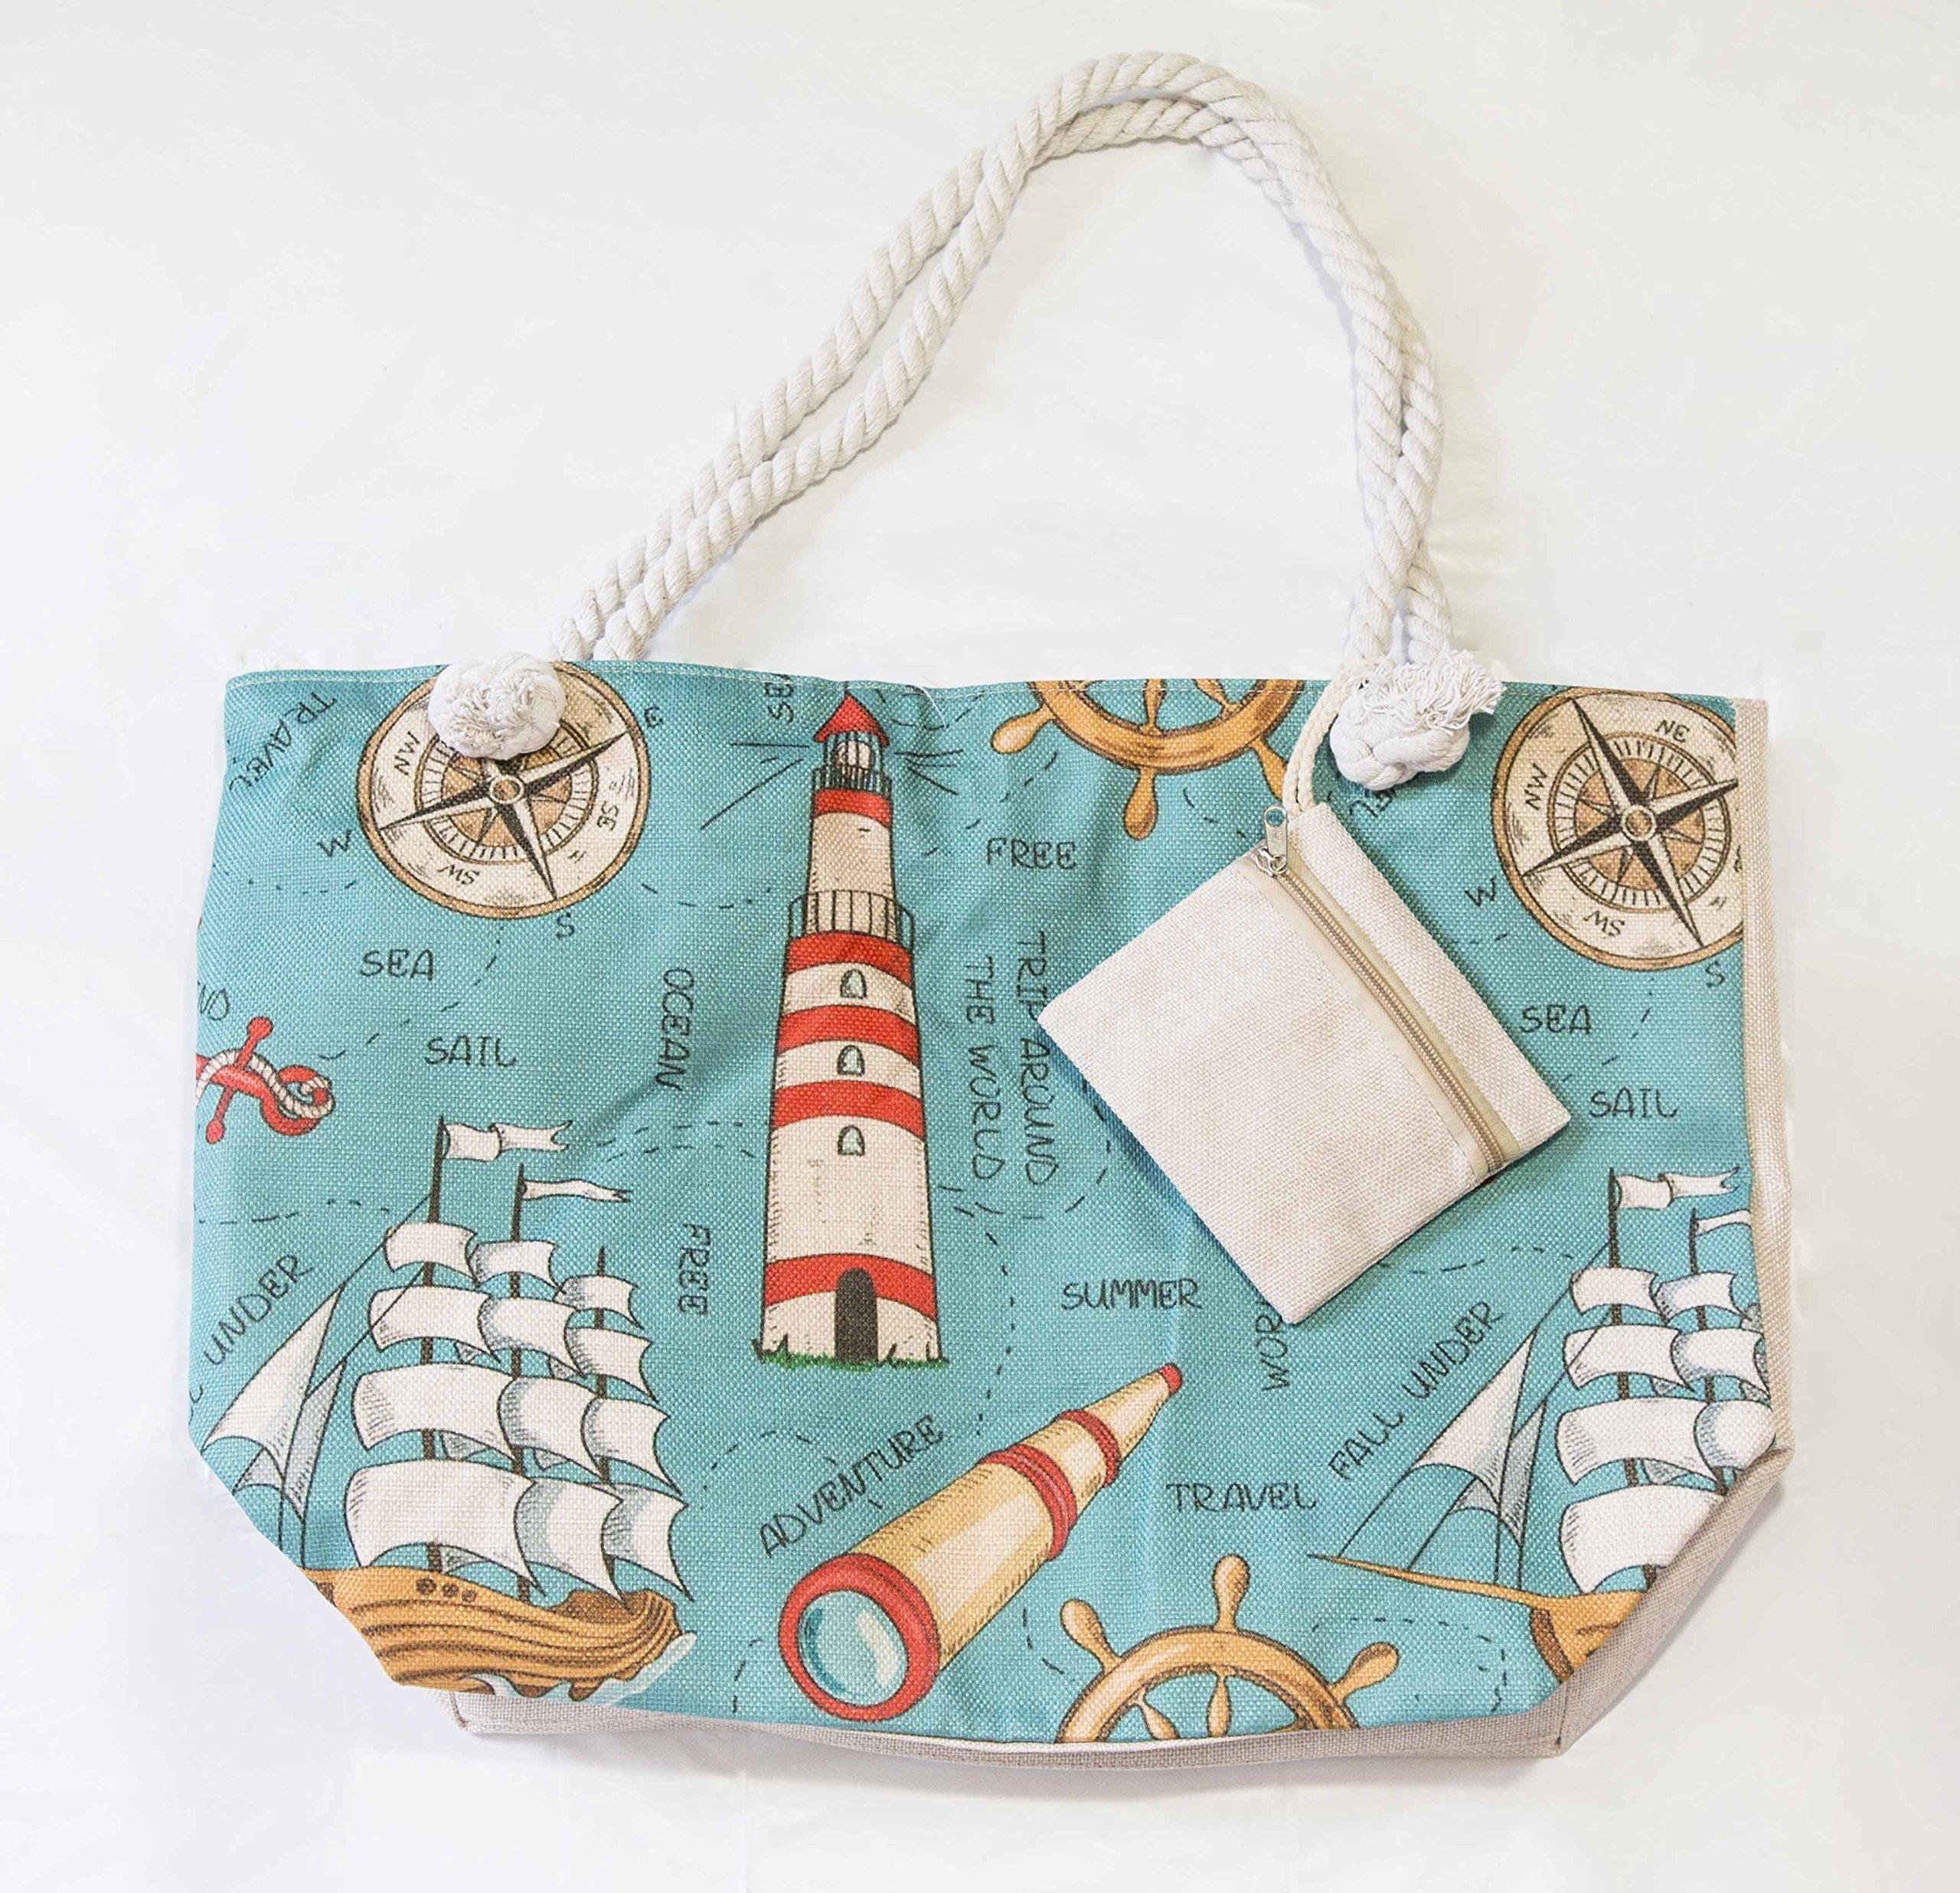 JJMG NEW Summer Beach Bag Stroller Friendly Women's Large Capacity Mom's Tote Beach Shoulder Bag With Rope Handles –Shopping Bag, Diaper Bag, Yoga Bag, Toys, Towels, Swim Suits, etc. by JJMG (Image #7)